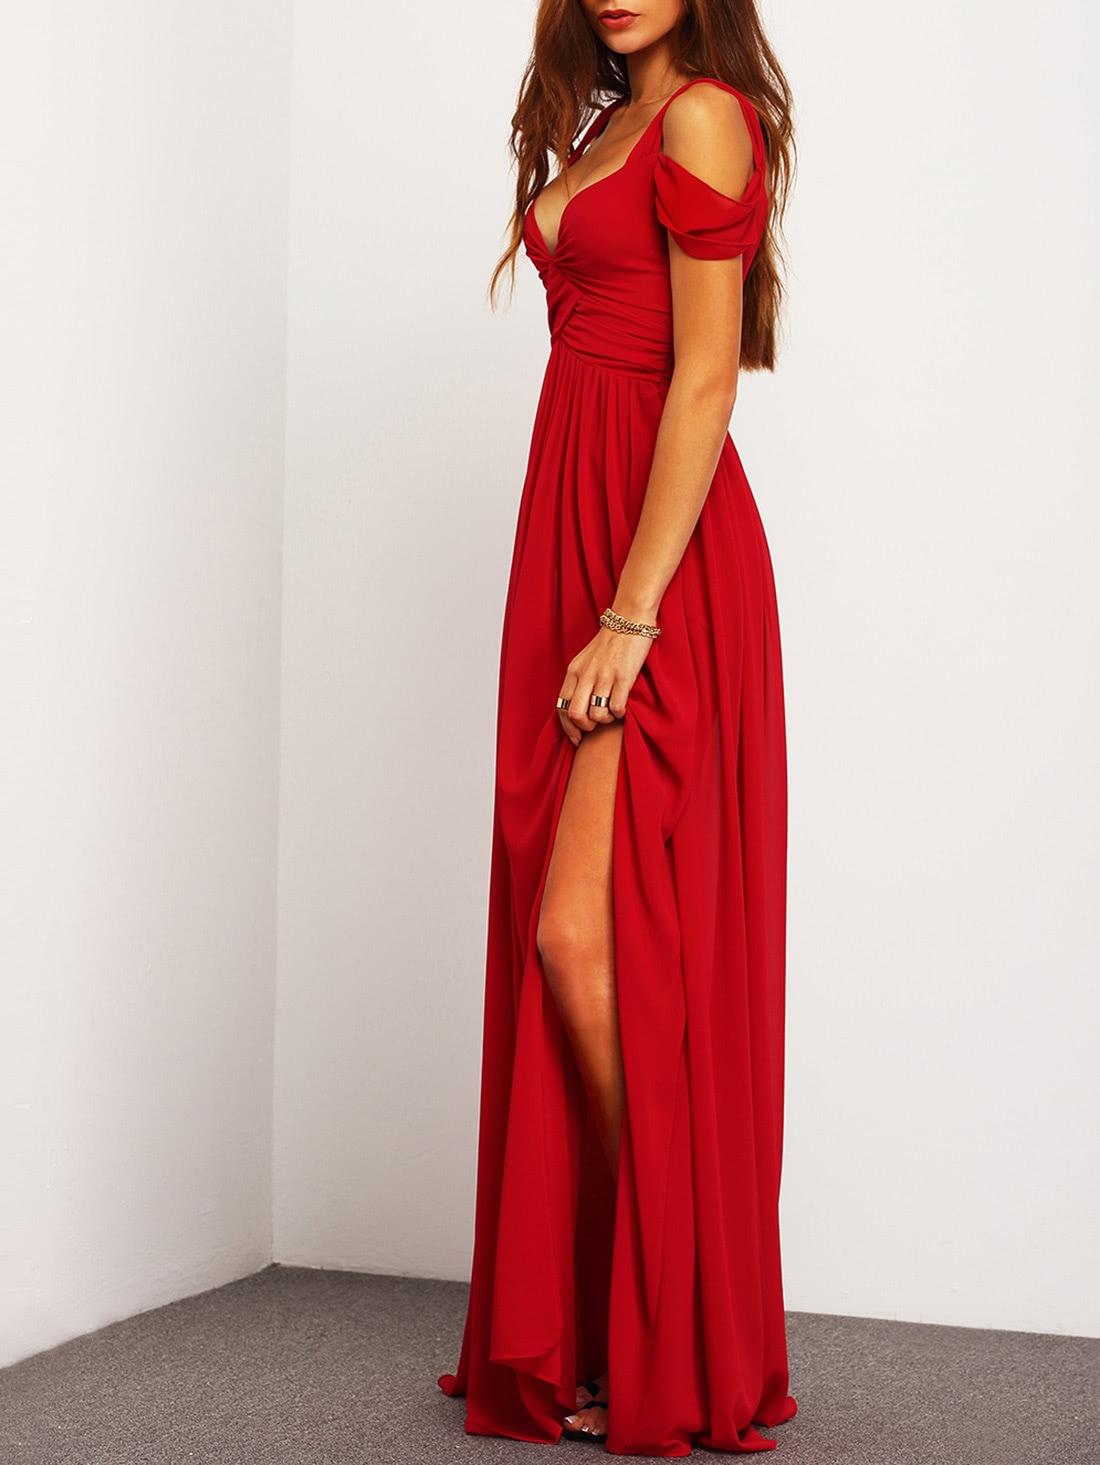 Off the shoulder red maxi dress